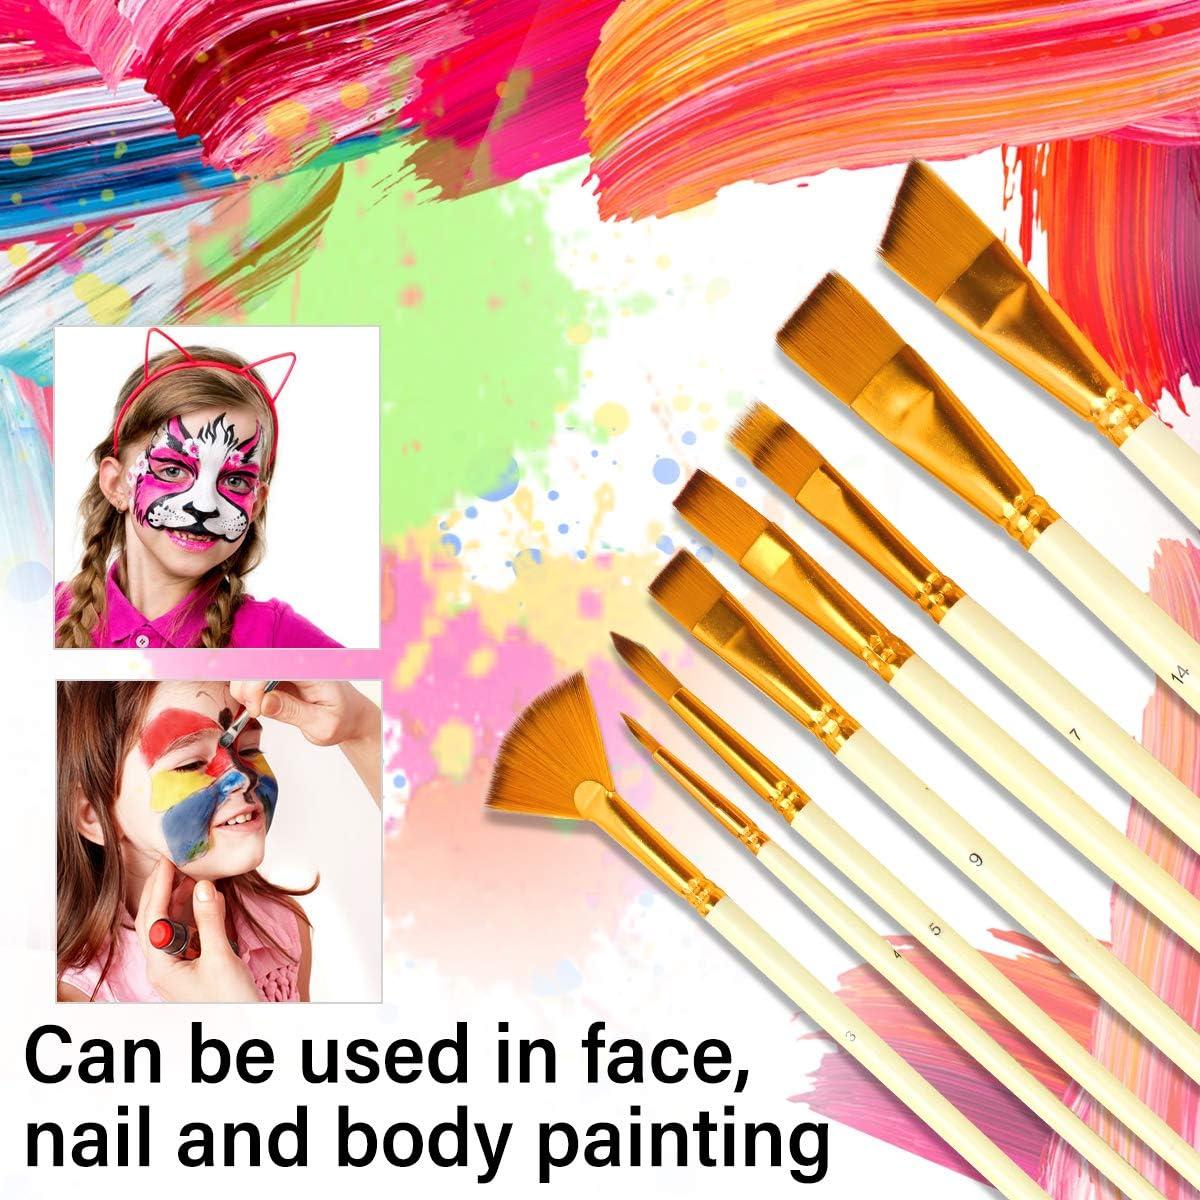 Juego de Pinceles 15 Unidades 2 Esponjas con 1 Rascador Pinceles de Artista,Pinceles de Pintura al /Óleo,Pinceles de Arte,Pinceles de Pintura Acr/ílica para Pintar al /Óleo//Acr/ílica//Acuarela